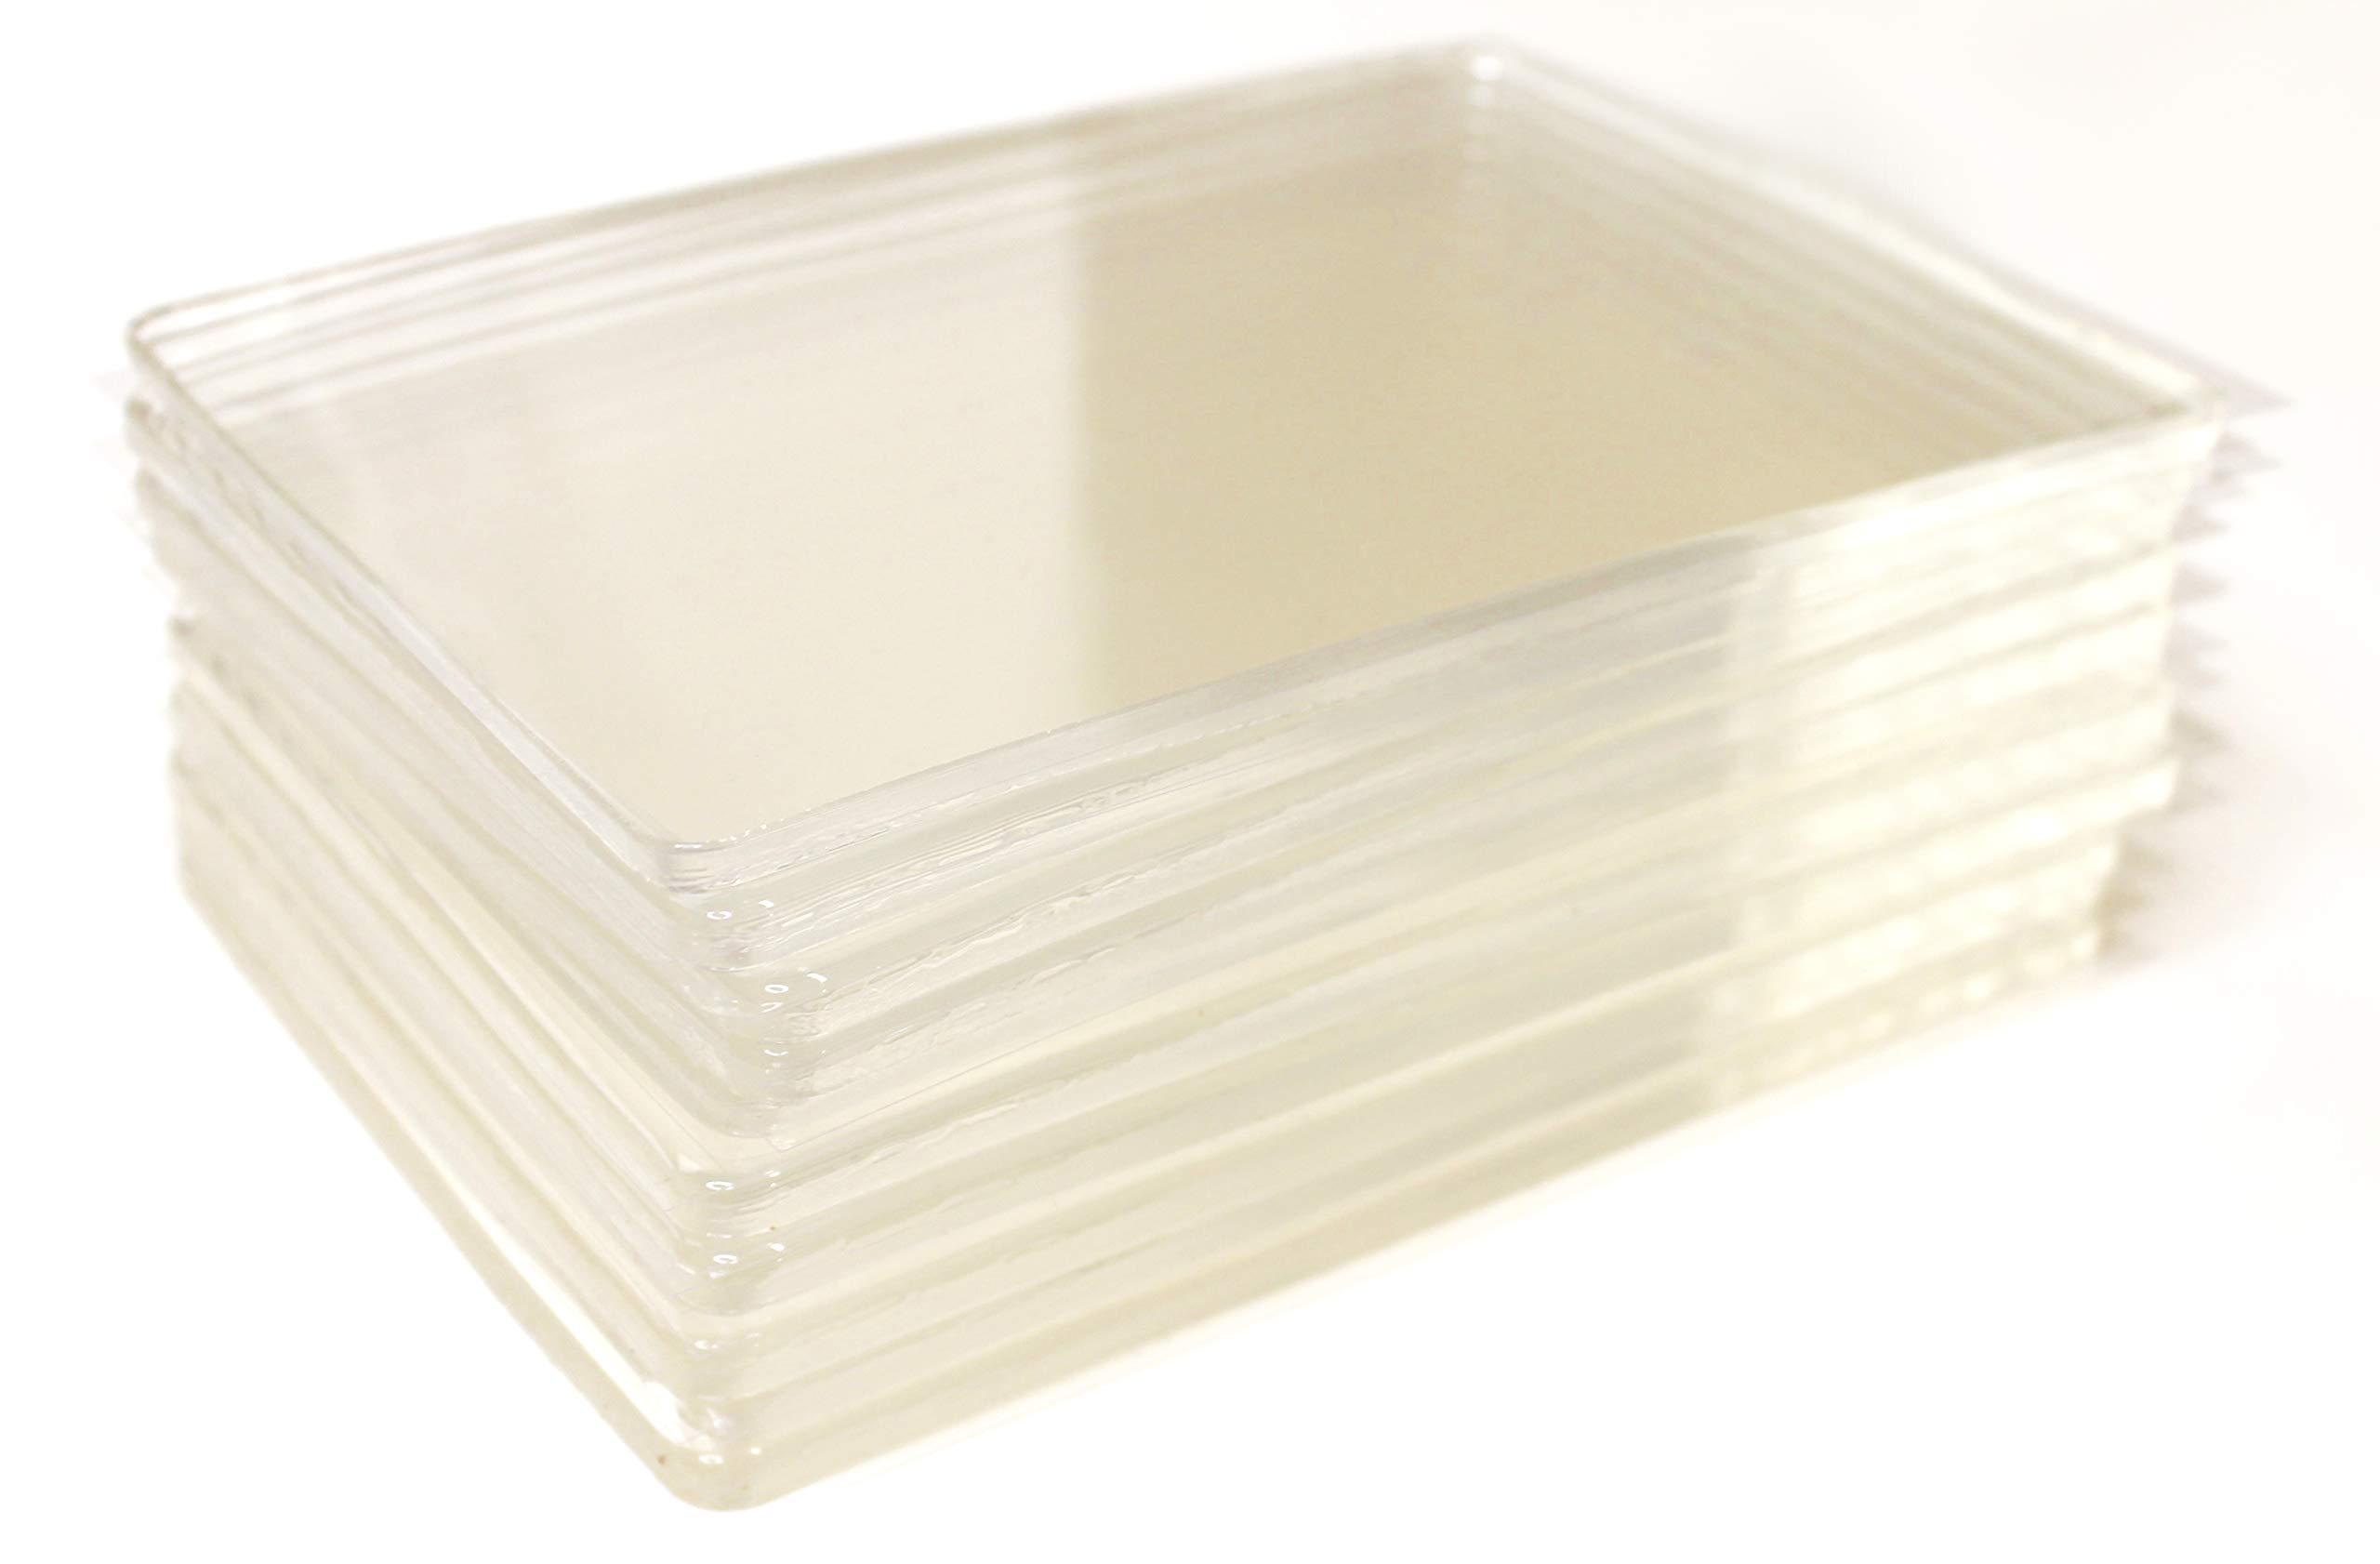 Gelli Arts Gel Printing Plate 5x7'' Class Pack by Gelli Arts